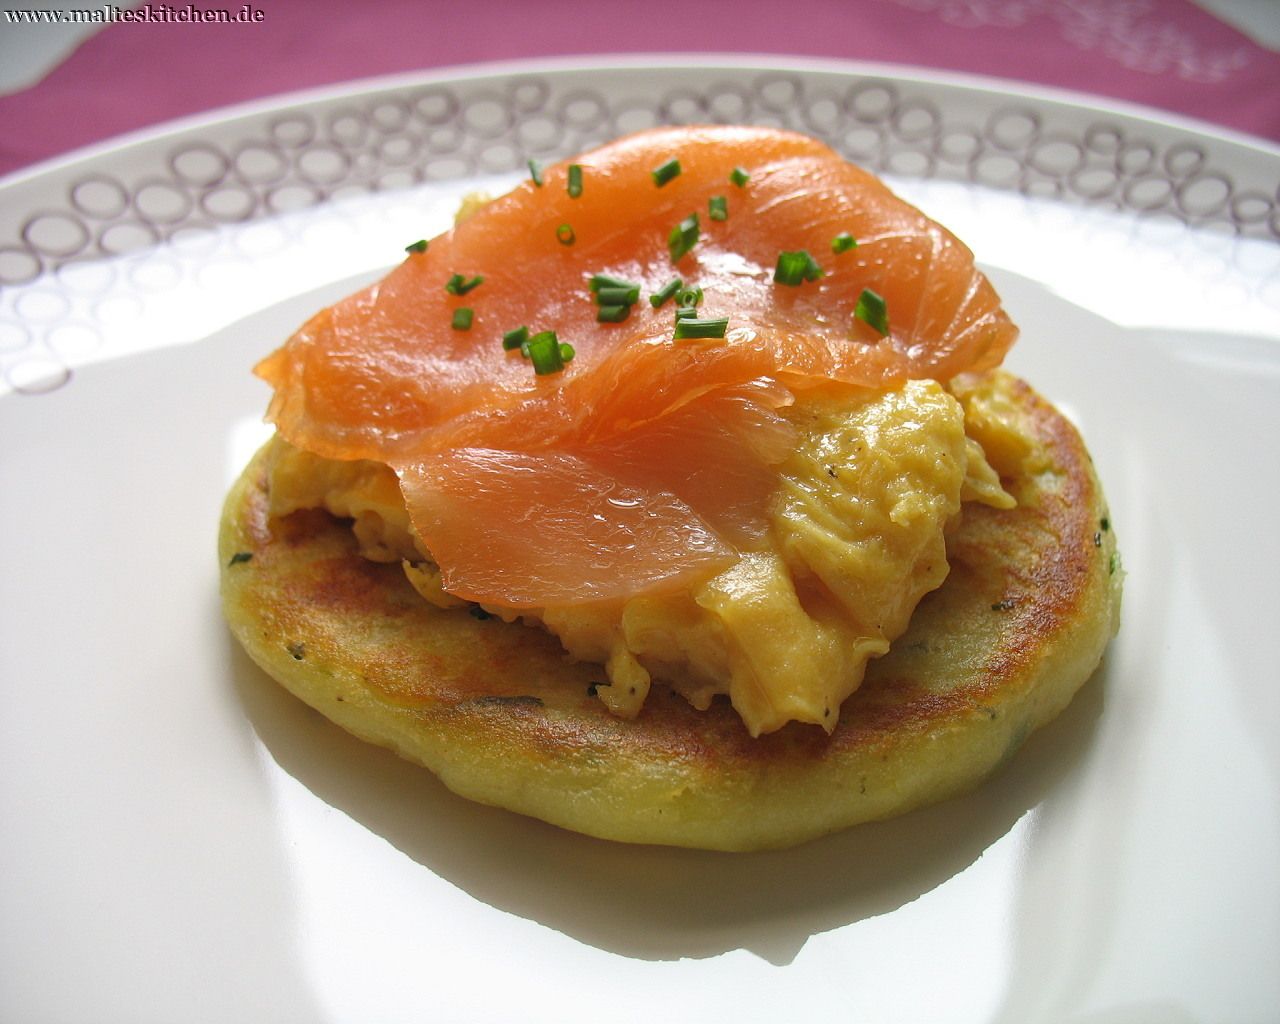 Rezept Glasgower Kartoffel Scones nach Jamie Oliver